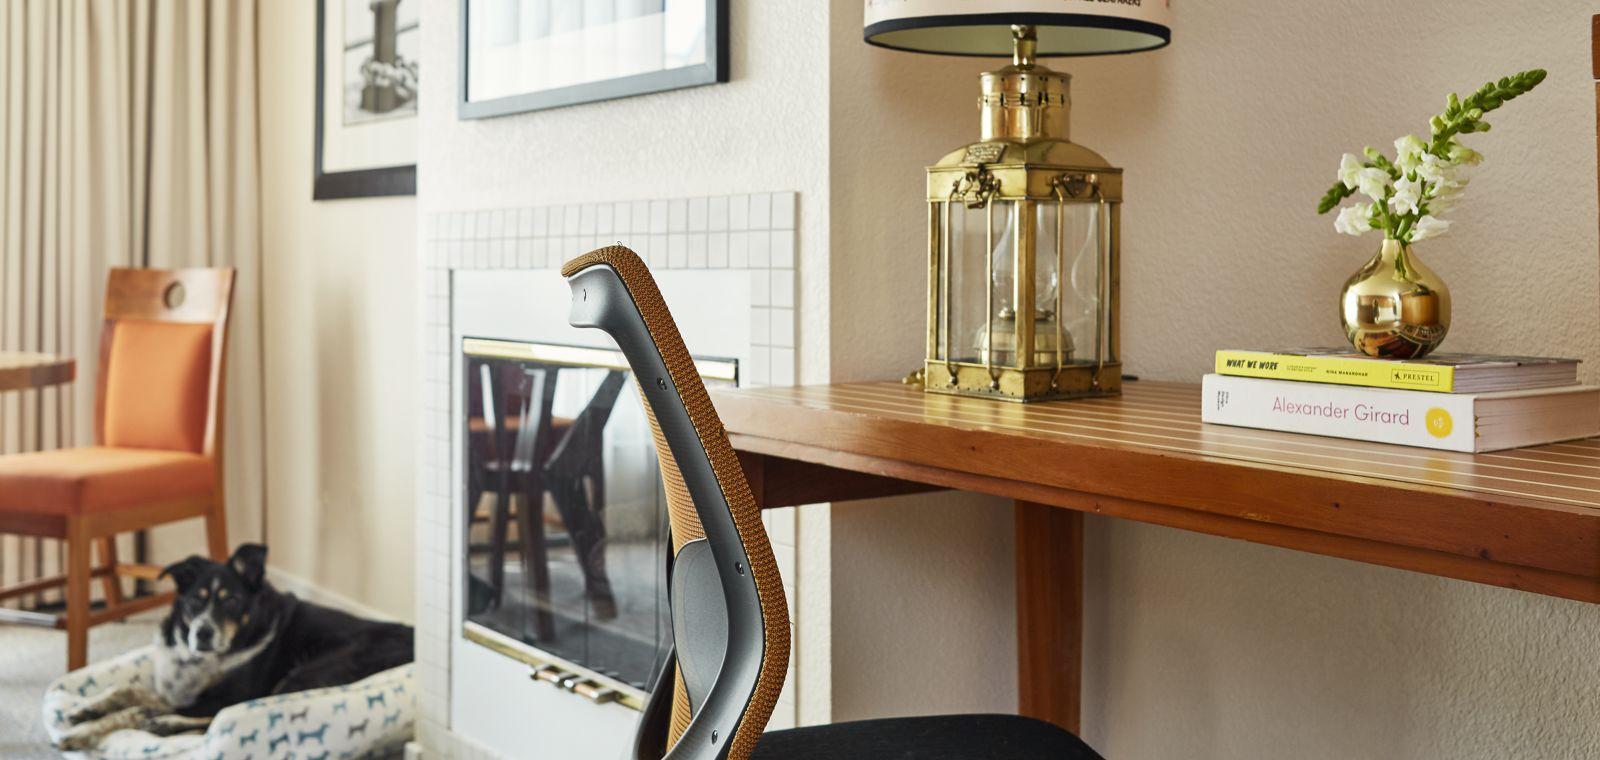 Waterfront-Hotel-Guestroom-Details-Desk-Pet-Friendly